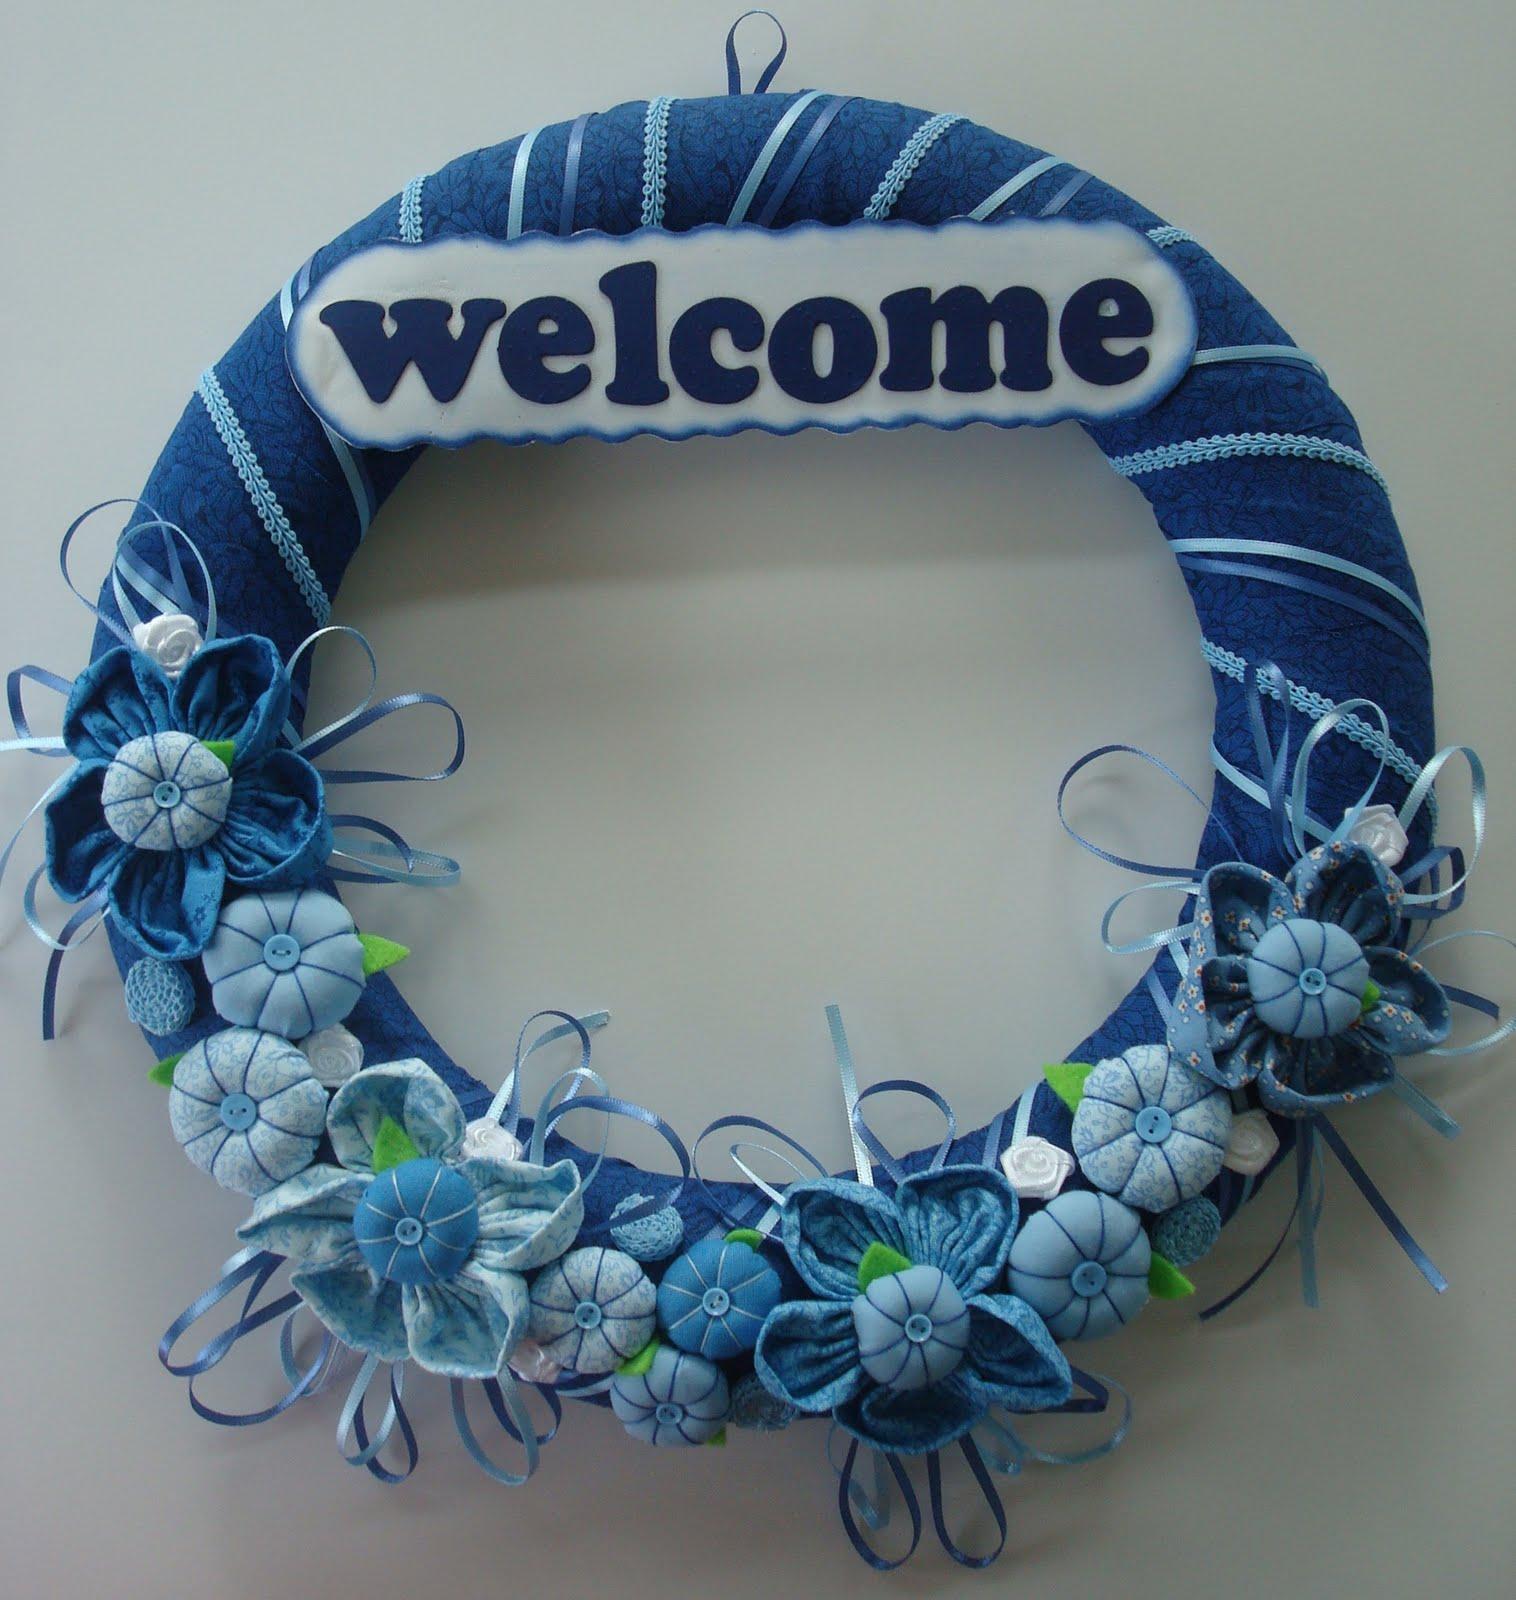 Handmade Gifts Decorated Styrofoam Wreath